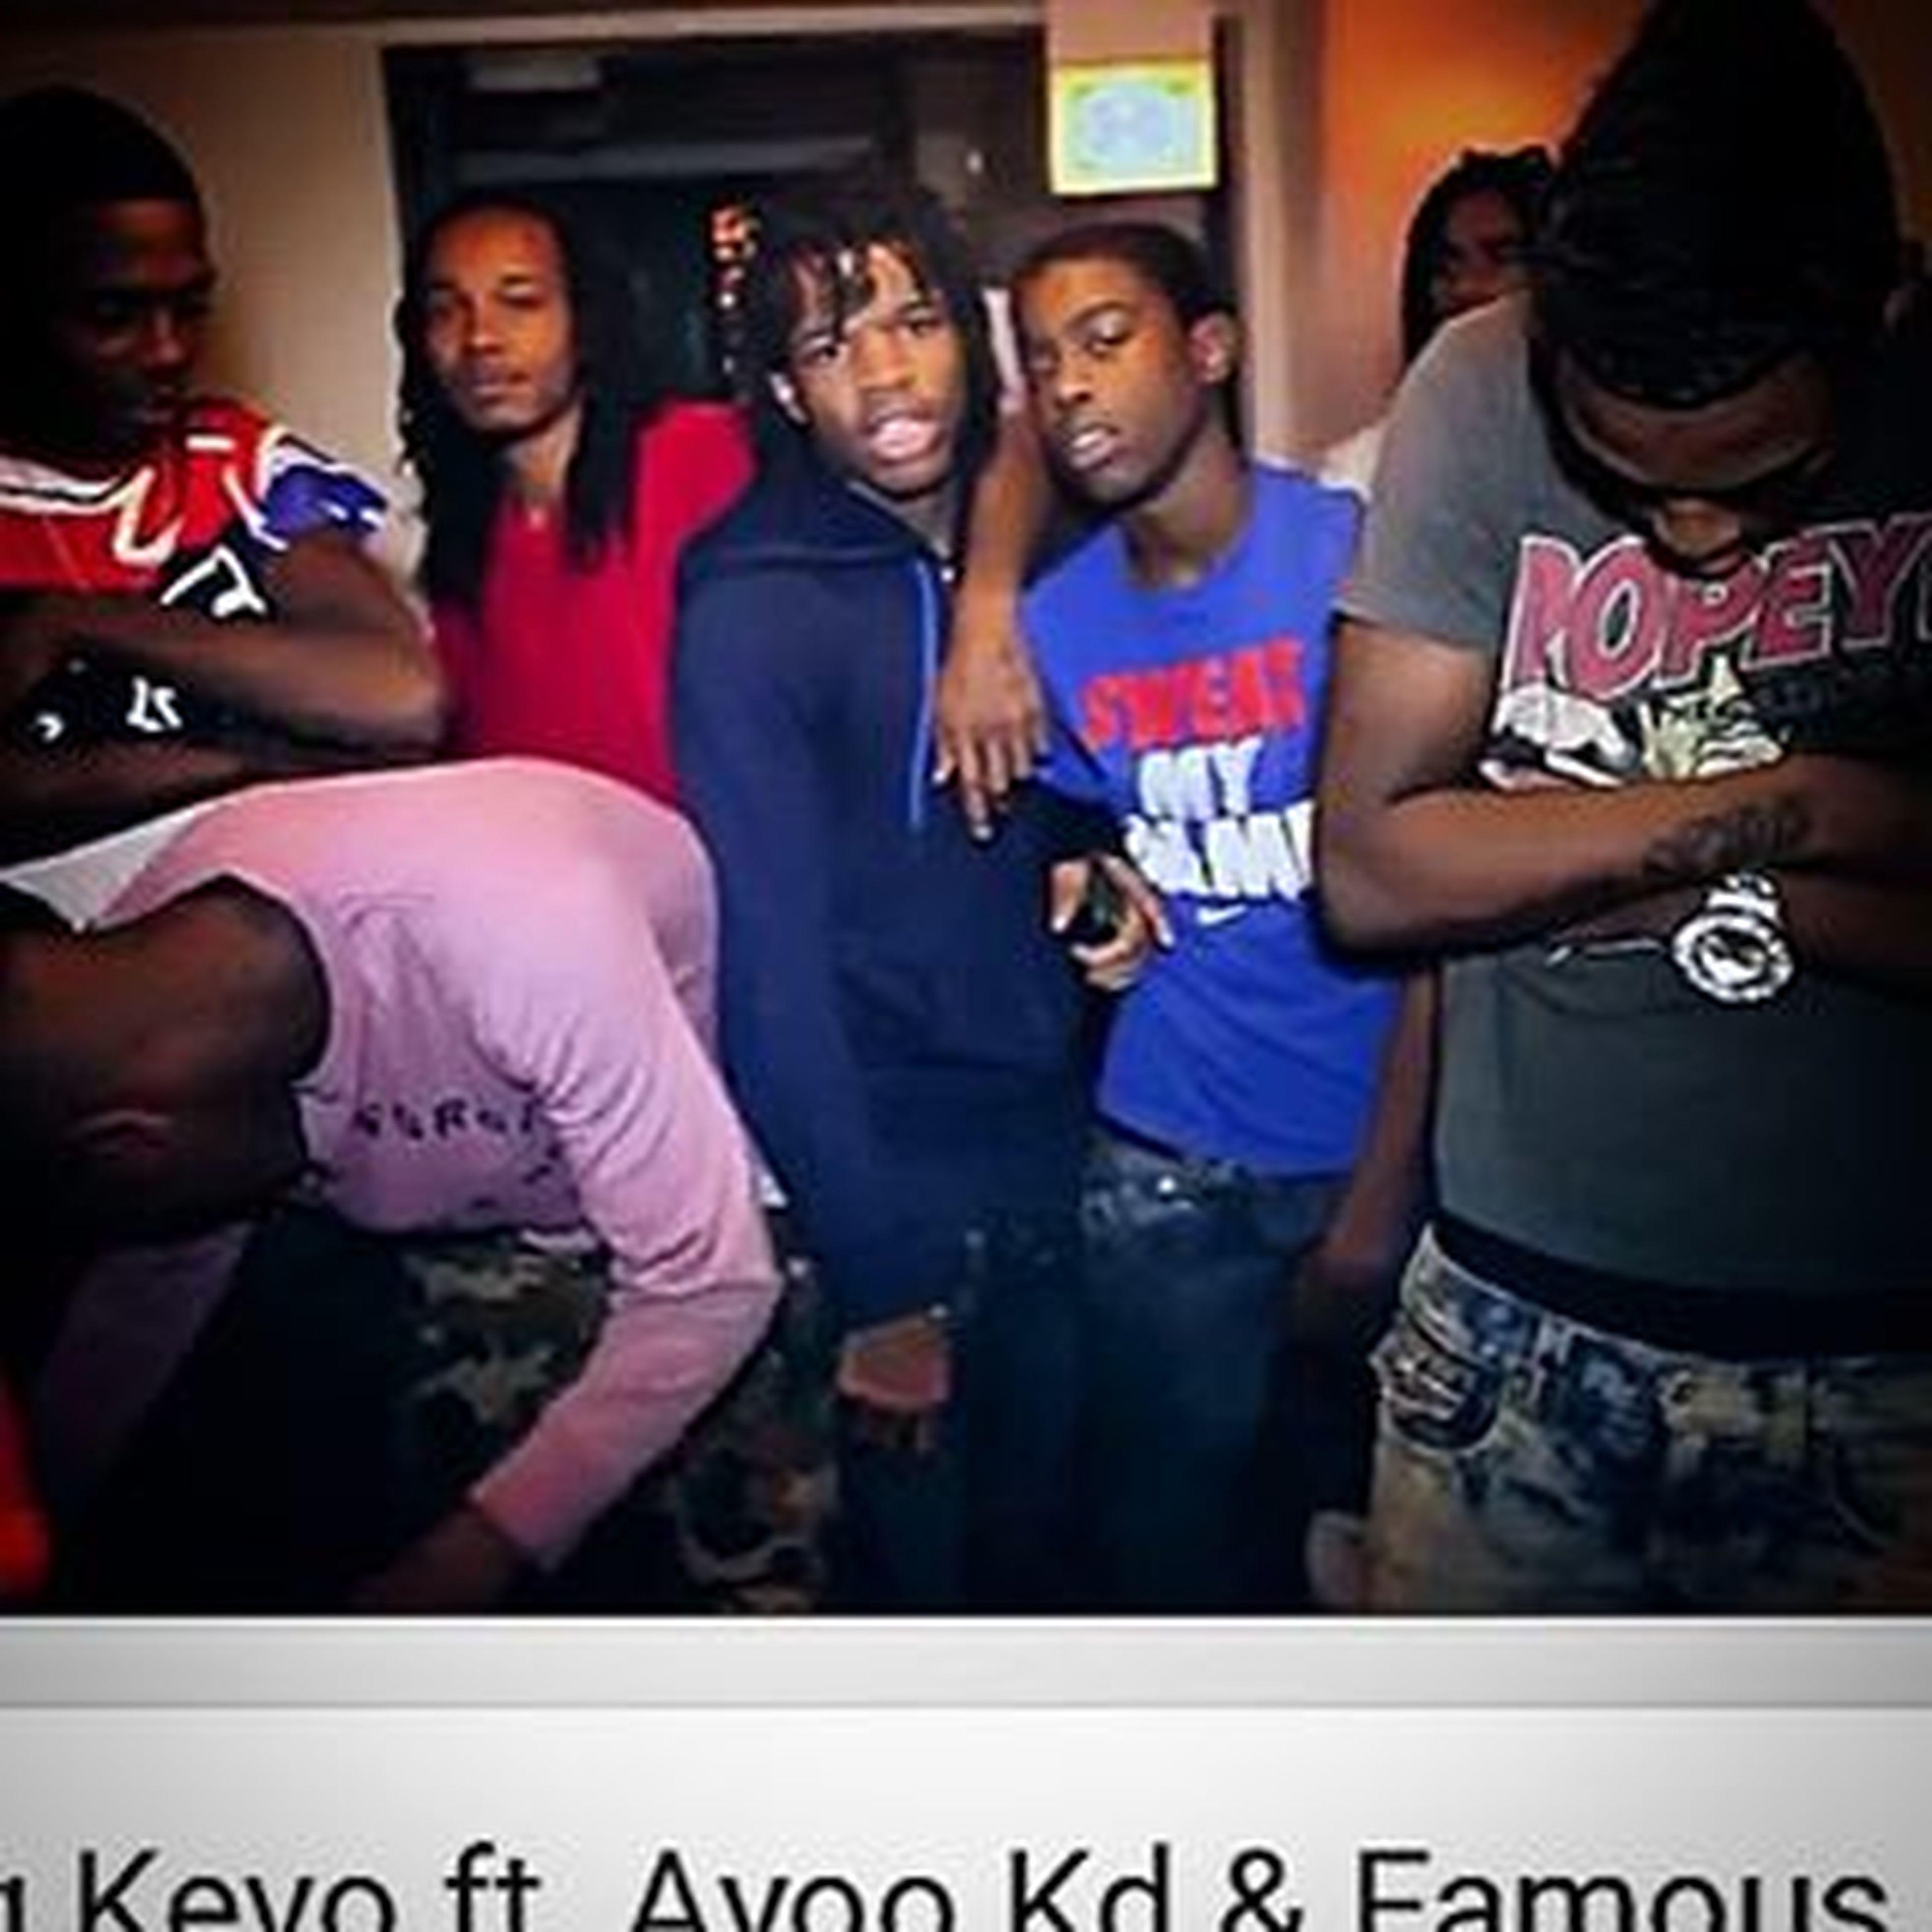 @Ayookd @kingkevo Ayookd Kingkevo